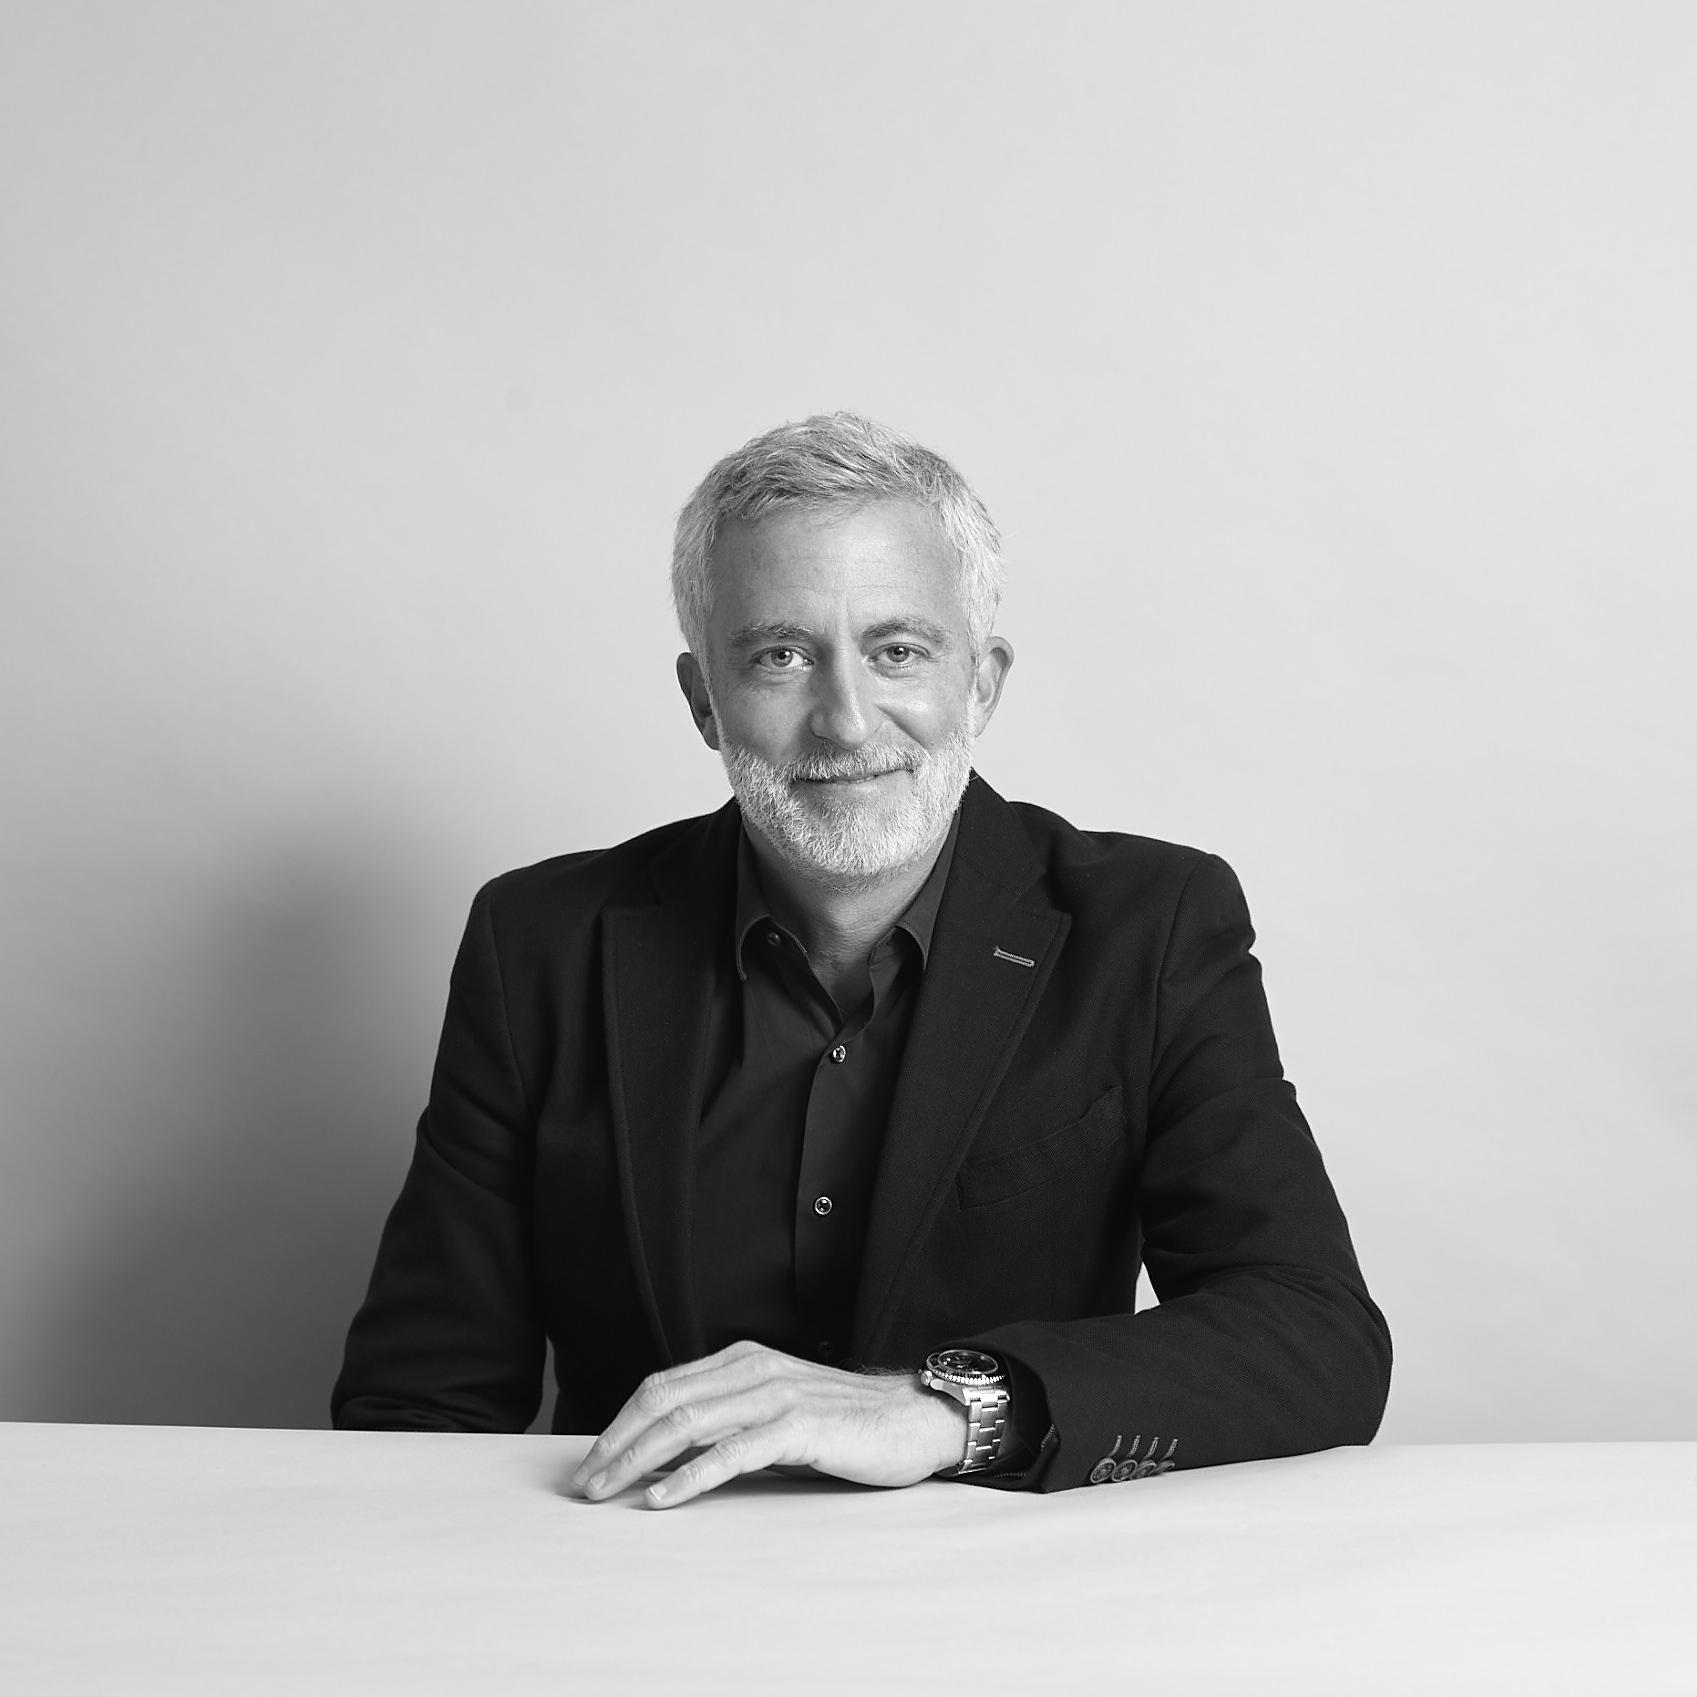 Guillaume Joinau